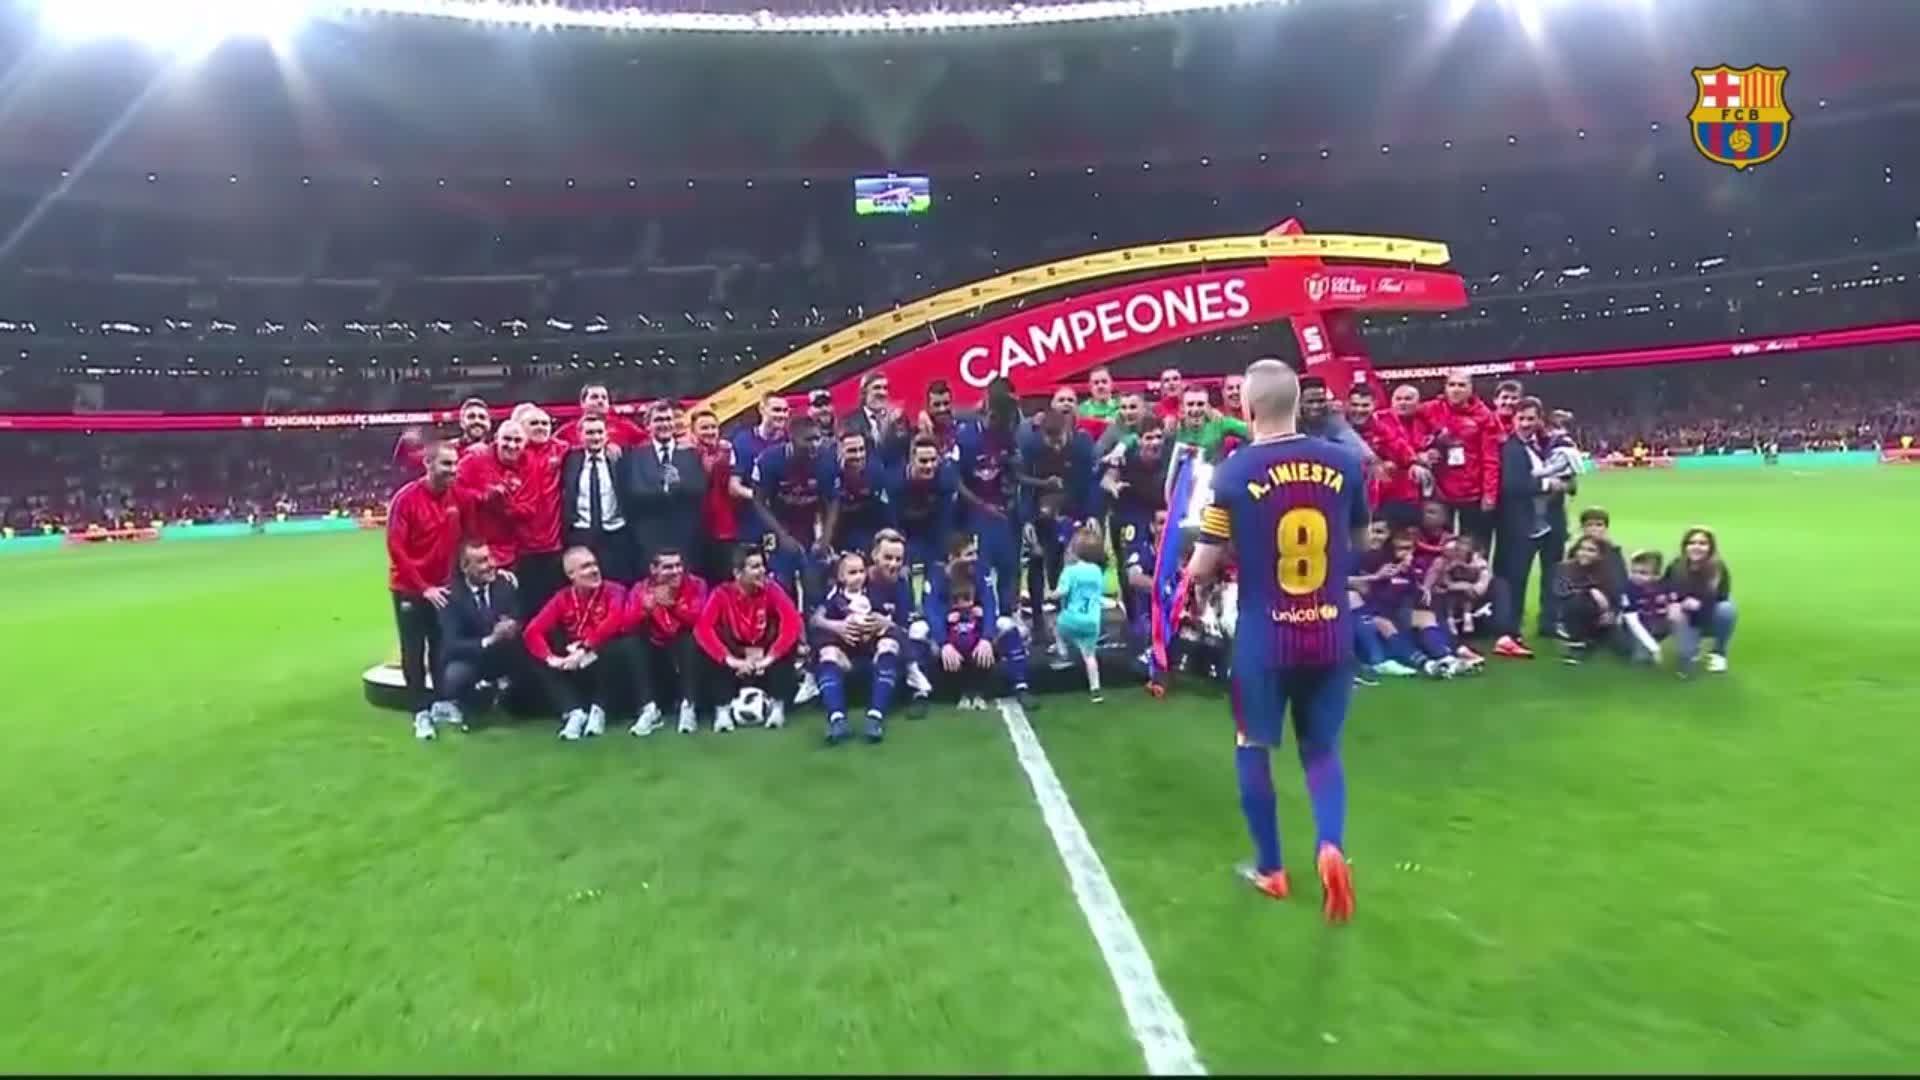 Campeones, campeones ...oe oe oe  �� #Copa30 ���� https://t.co/pUtGKHTEbk